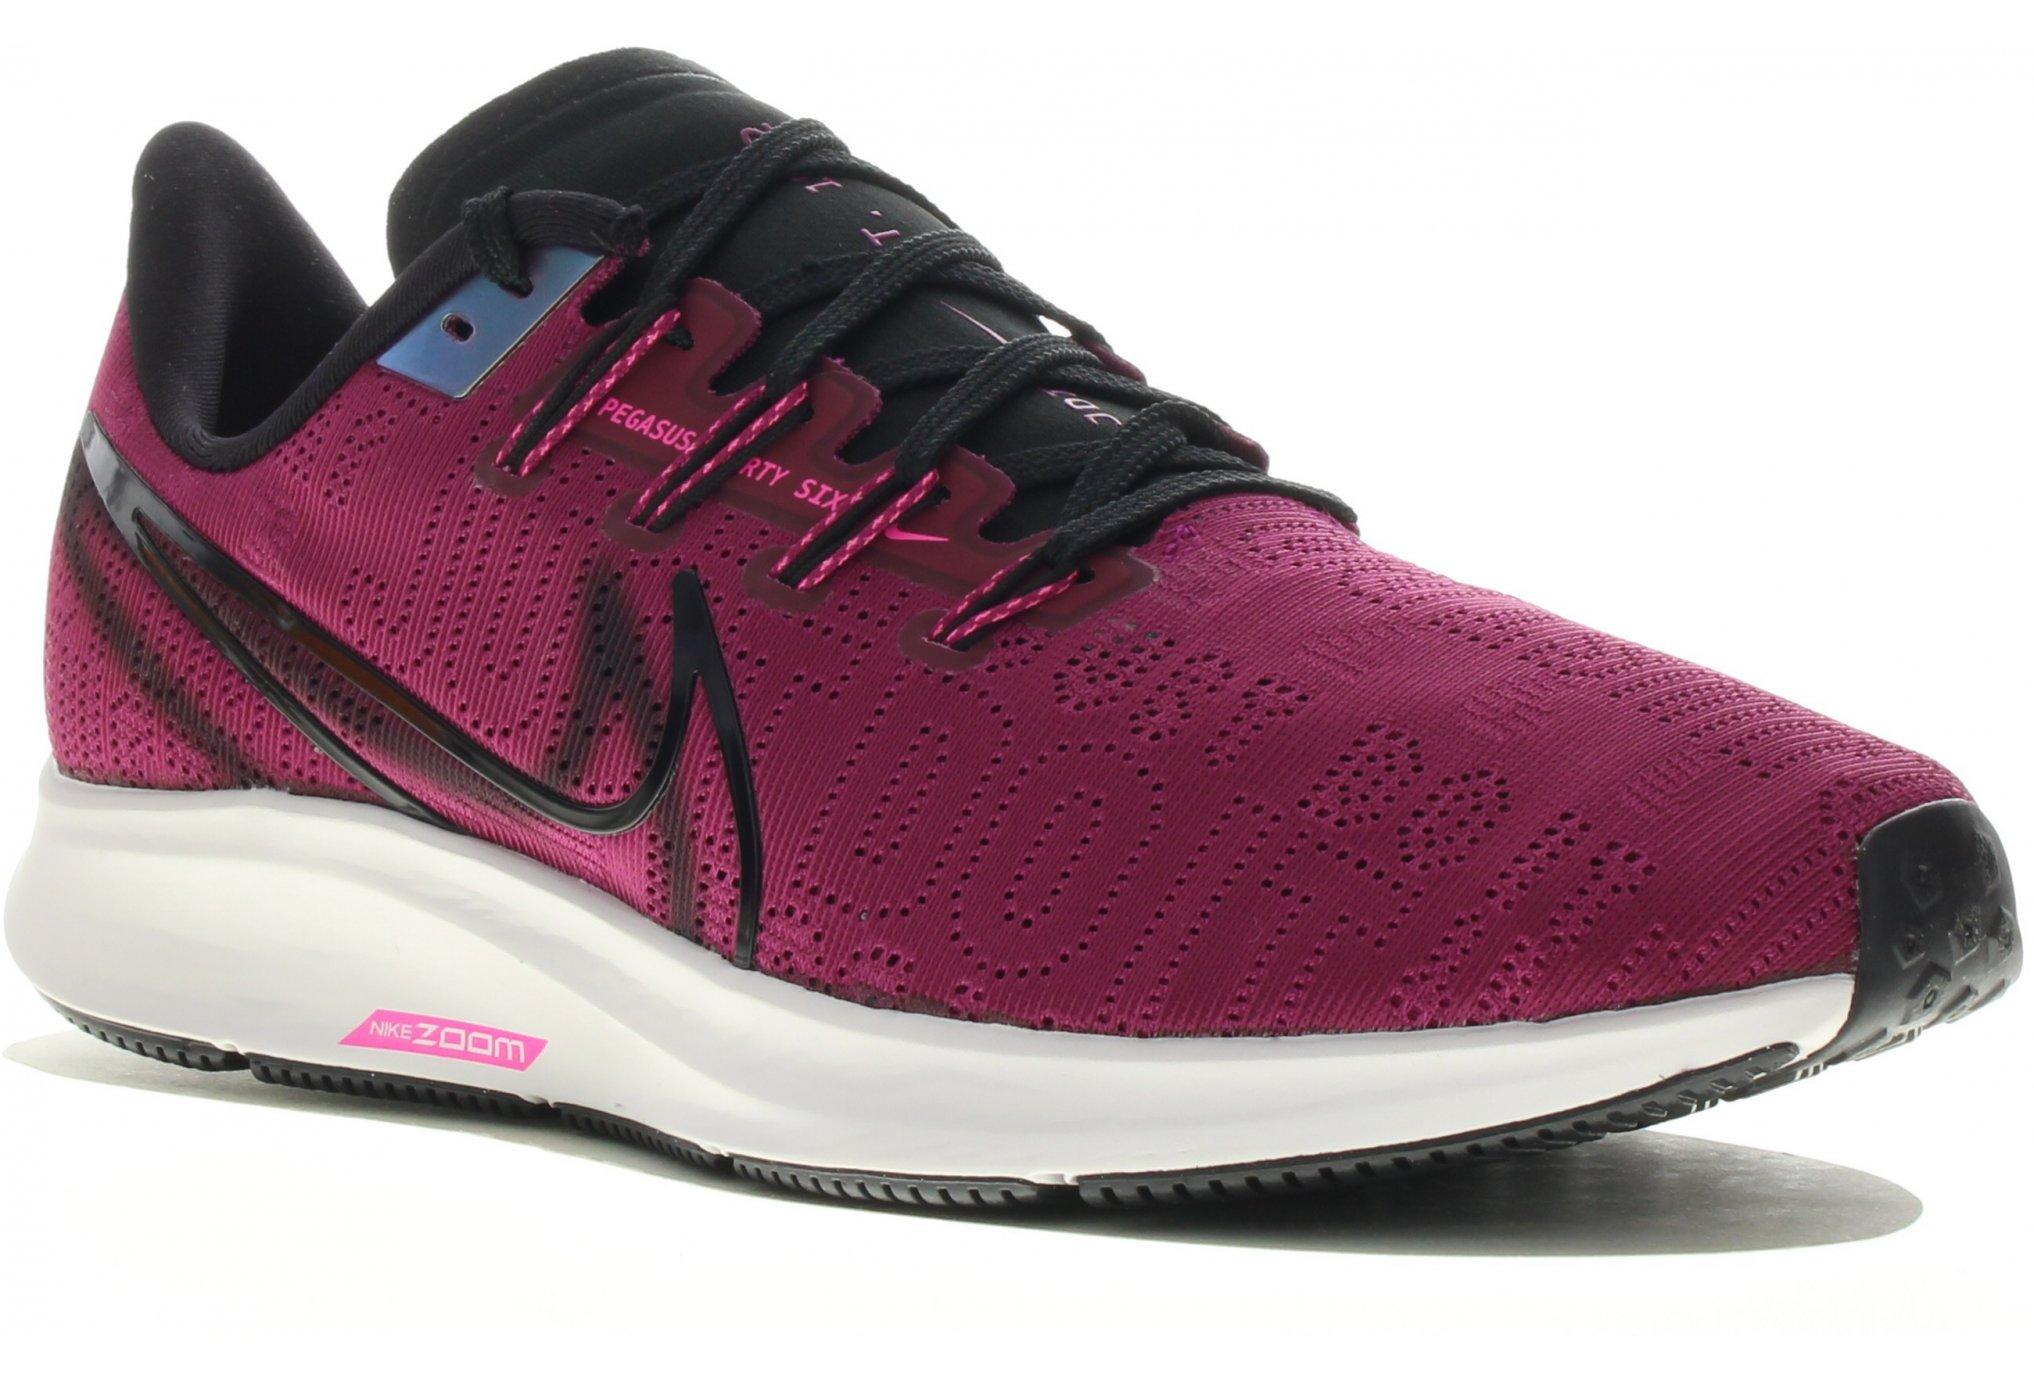 Nike Air Zoom Pegasus 36 Premium Chaussures running femme